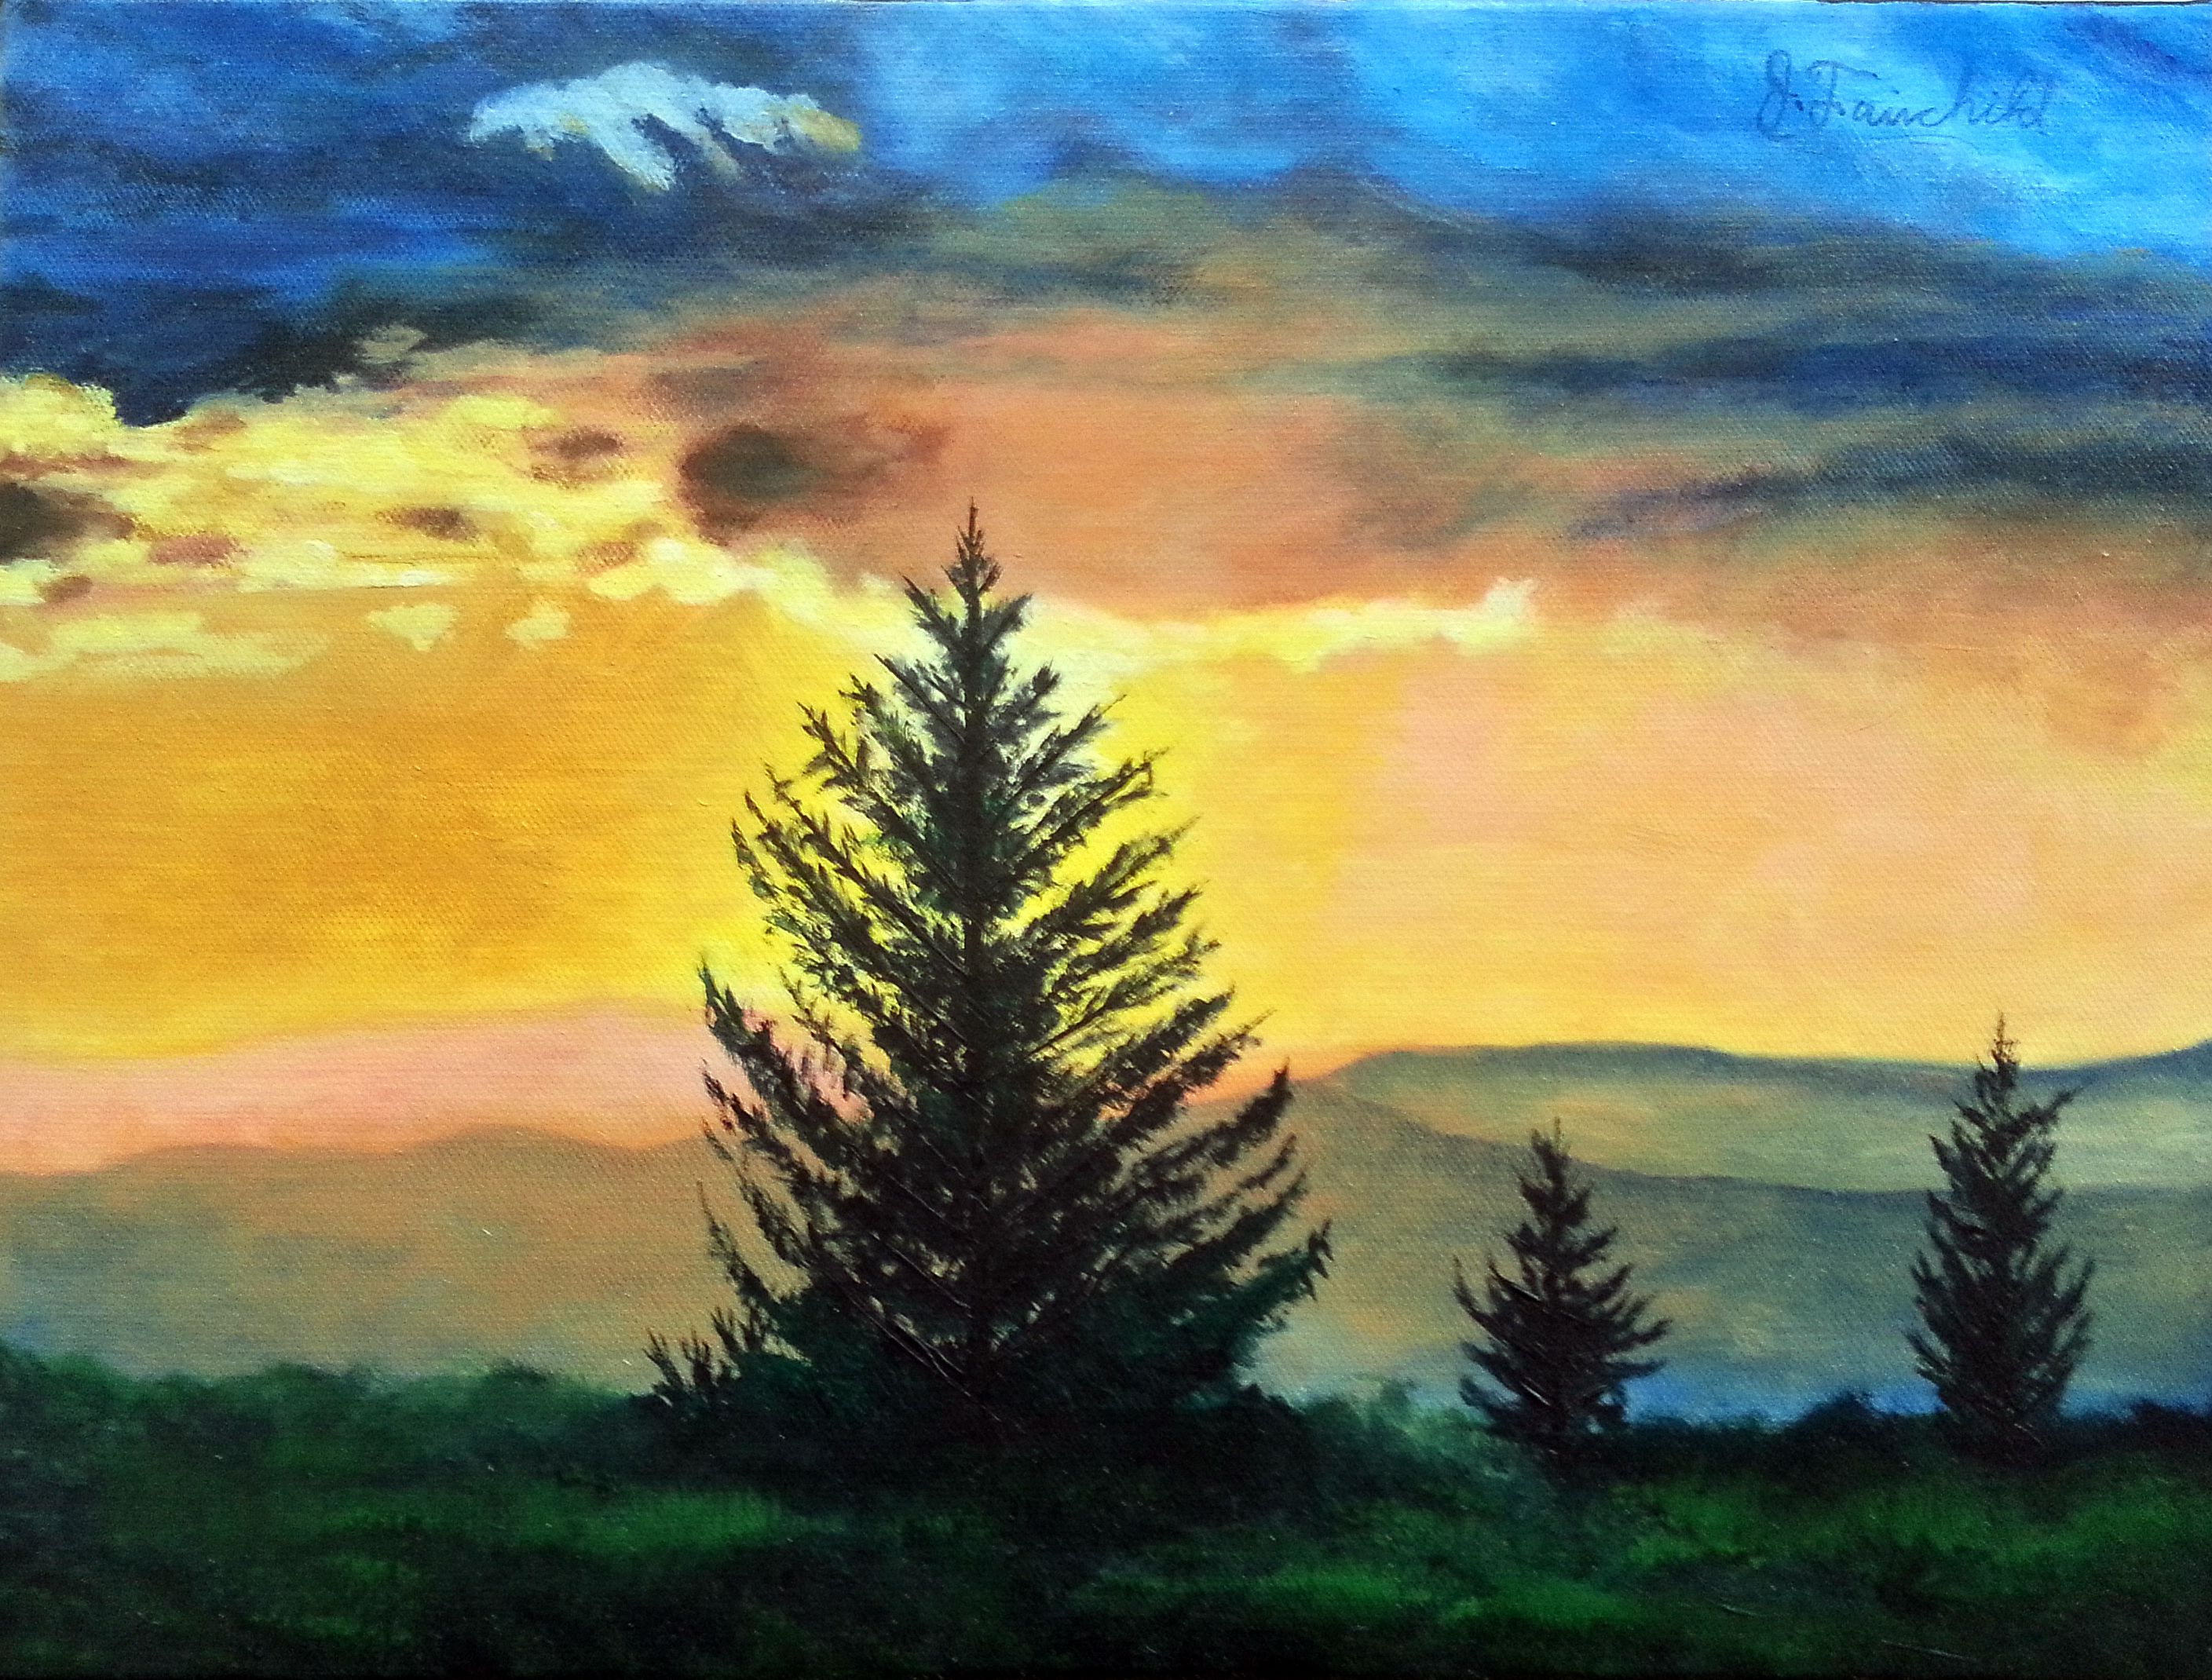 Sunrise Mountain Original Oil By James Fairchild 16x12 On Sale